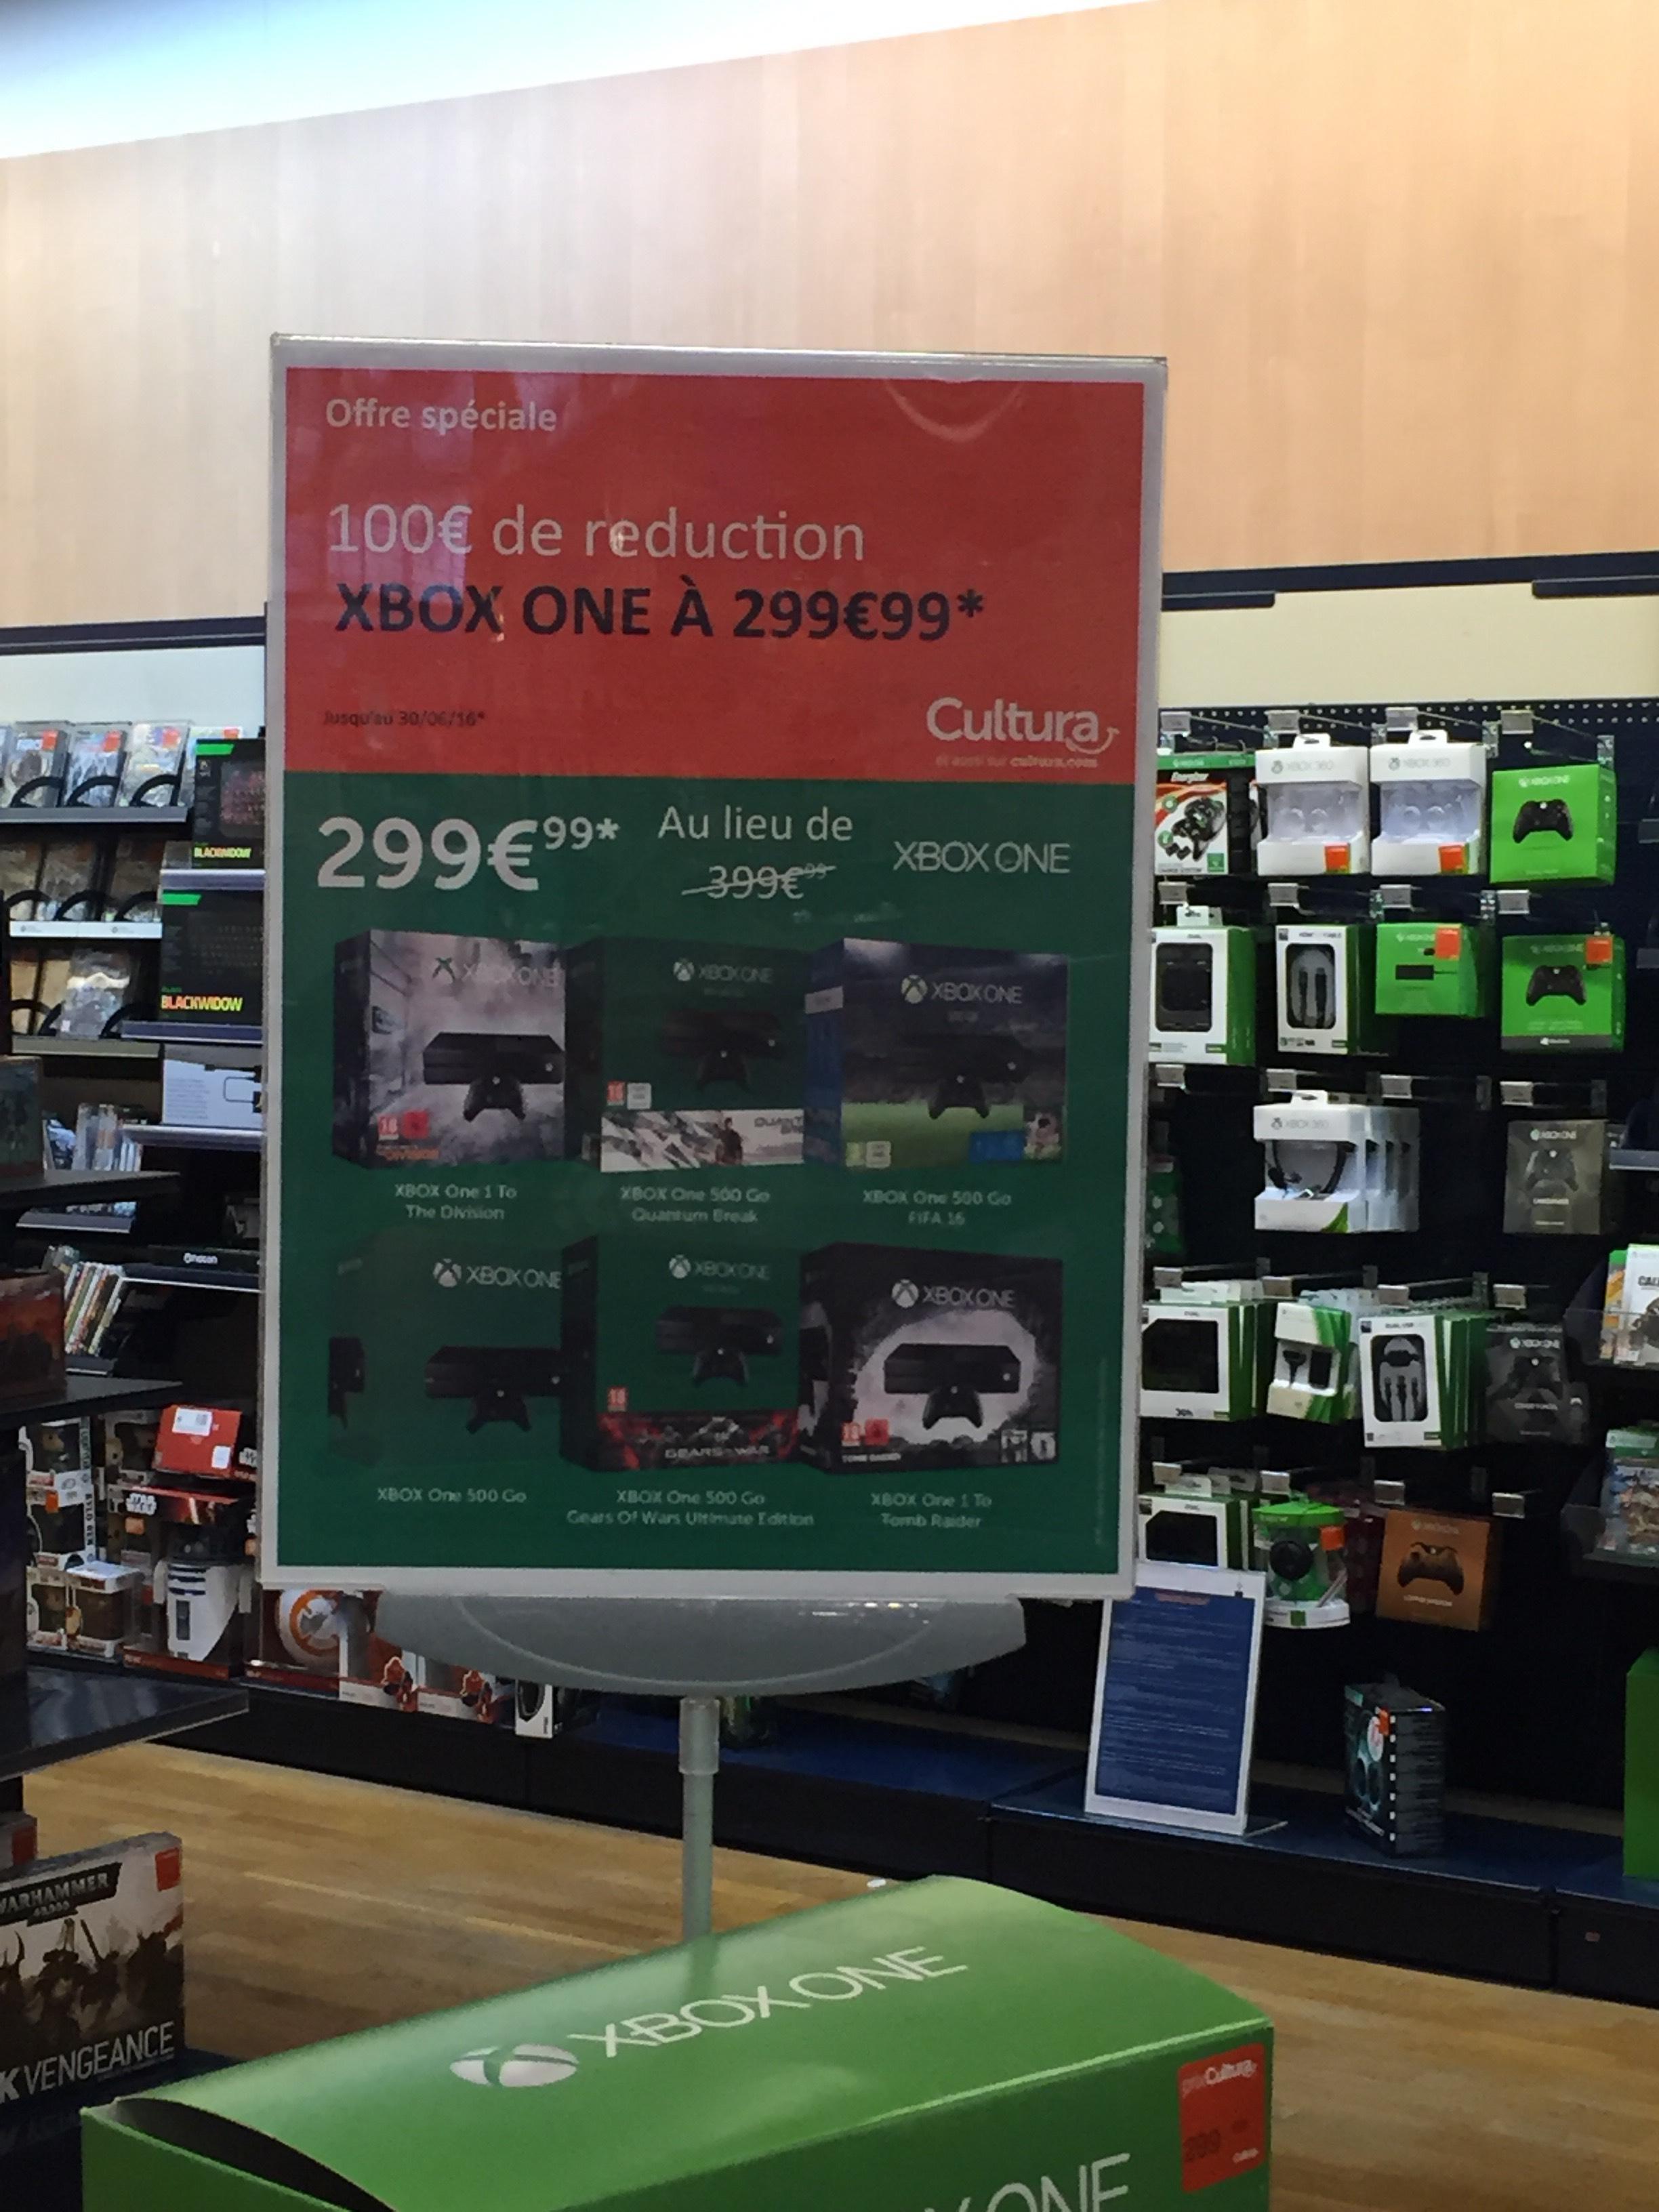 Sélection de packs Xbox One à 299.99€ - Ex : Xbox One 1To + The Division